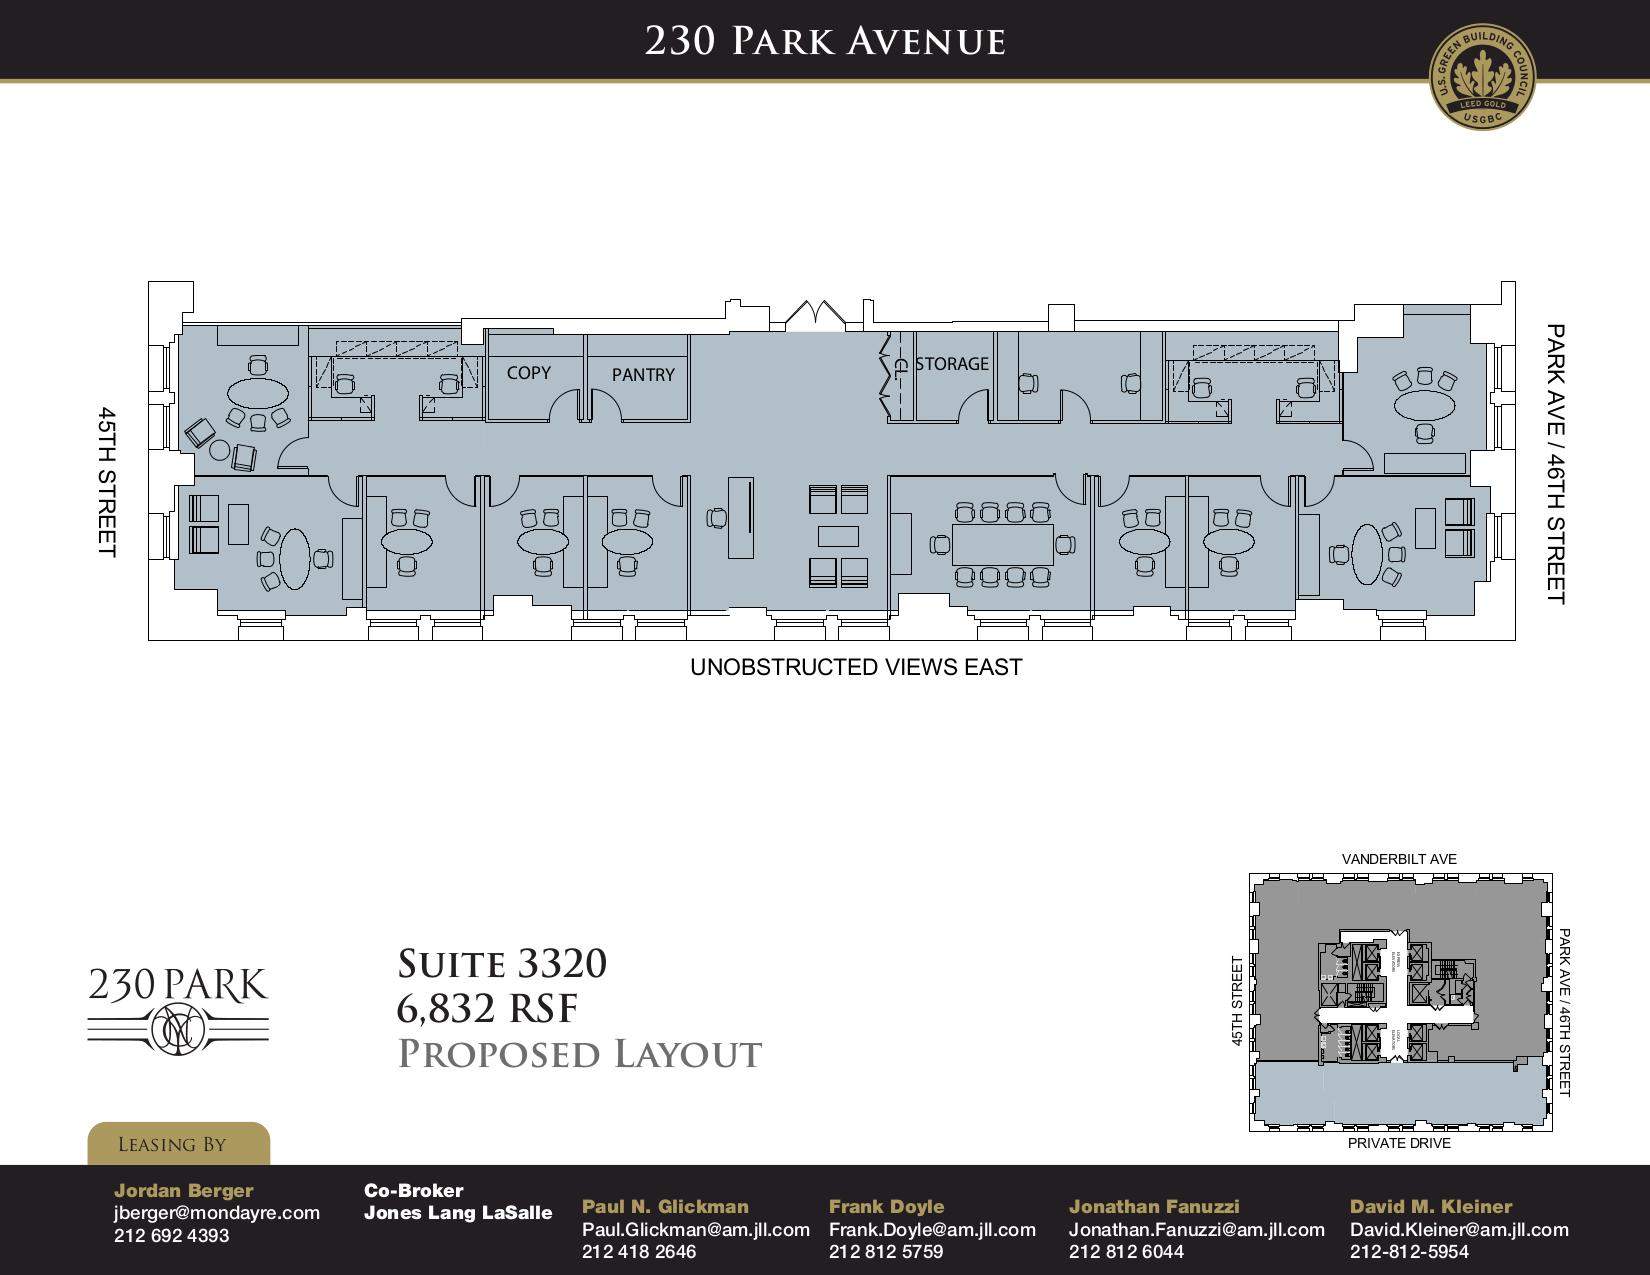 502 park ave ph 31 32 condo apartment sale at trump park avenue